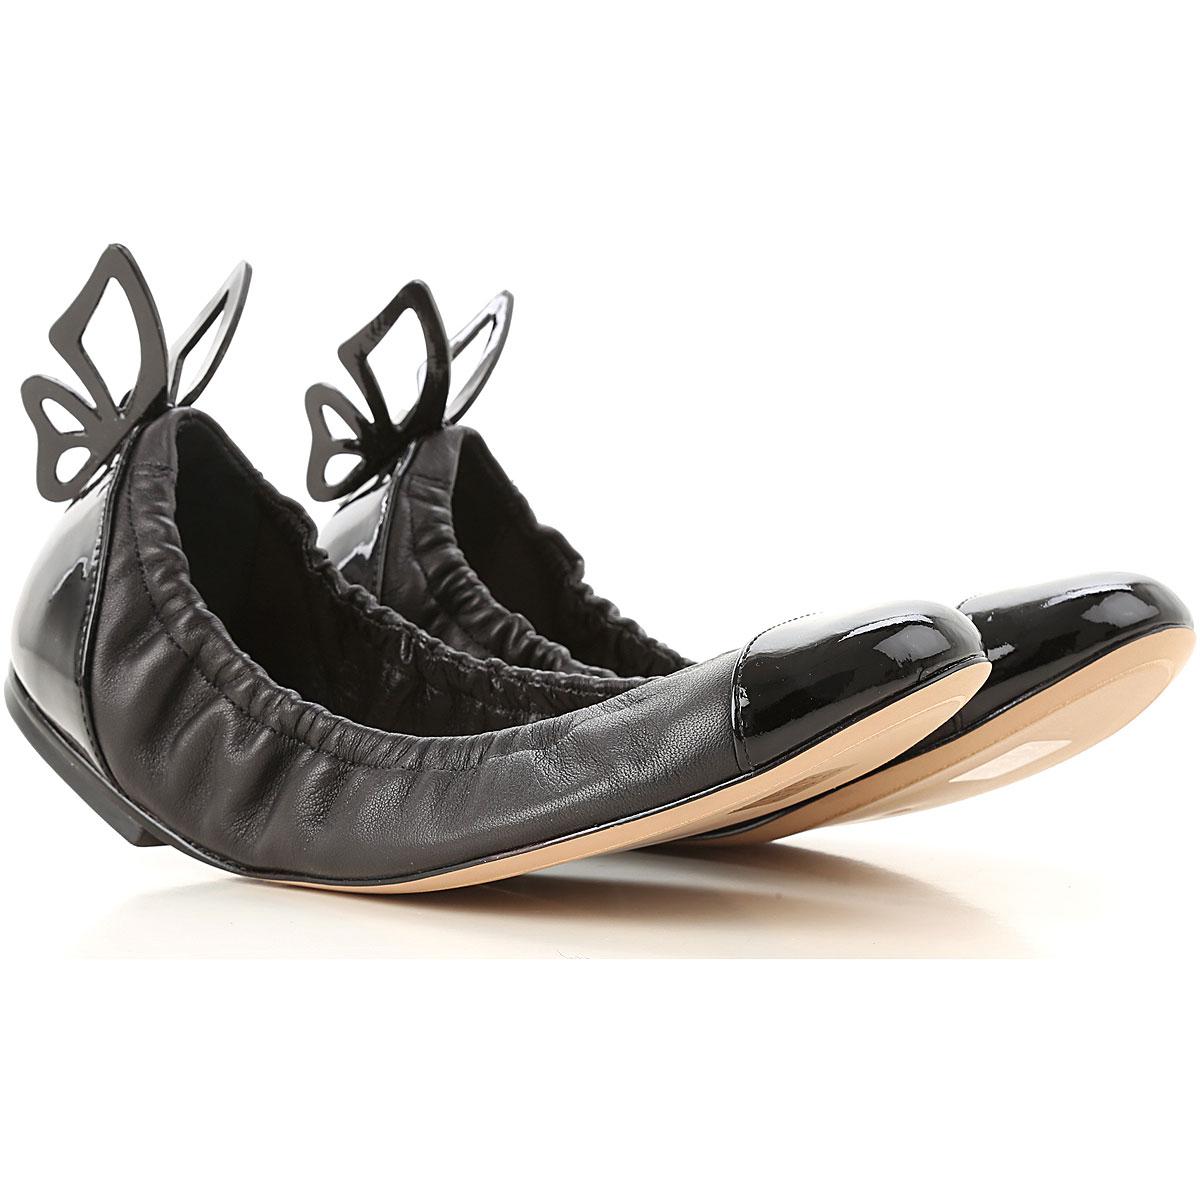 Image of Sophia Webster Ballet Flats Ballerina Shoes for Women, Black, Leather, 2017, 5 6 7 8